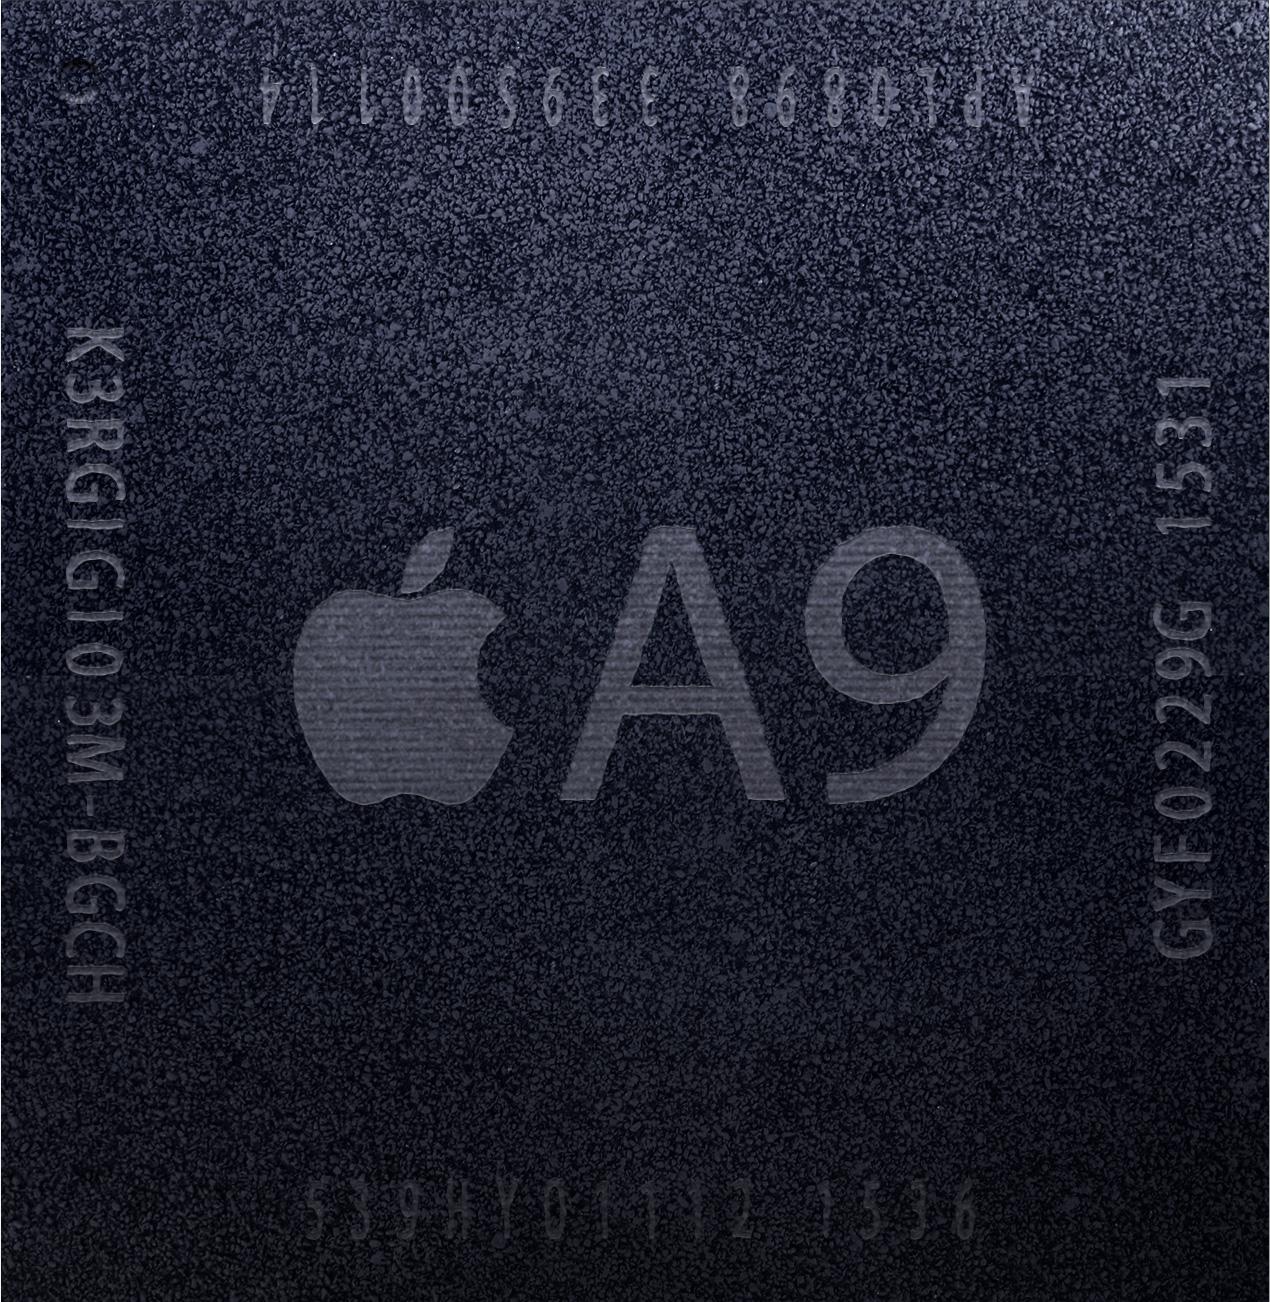 Apple A9 - Wikipedia